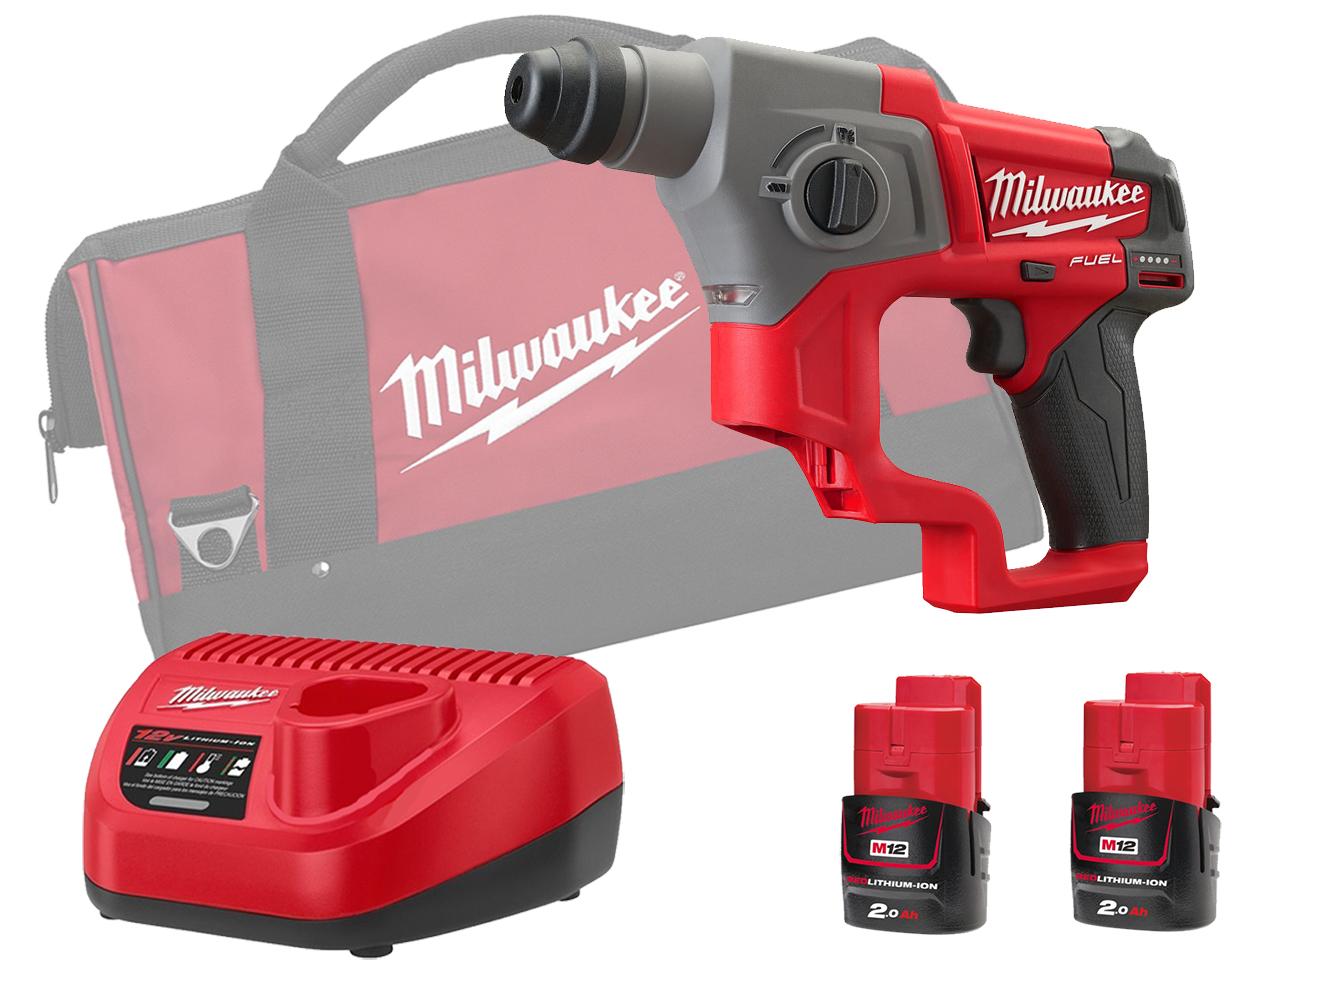 Milwaukee M12CH 12V Fuel SDS Plus 2 Mode Hammer - 2.0Ah Pack